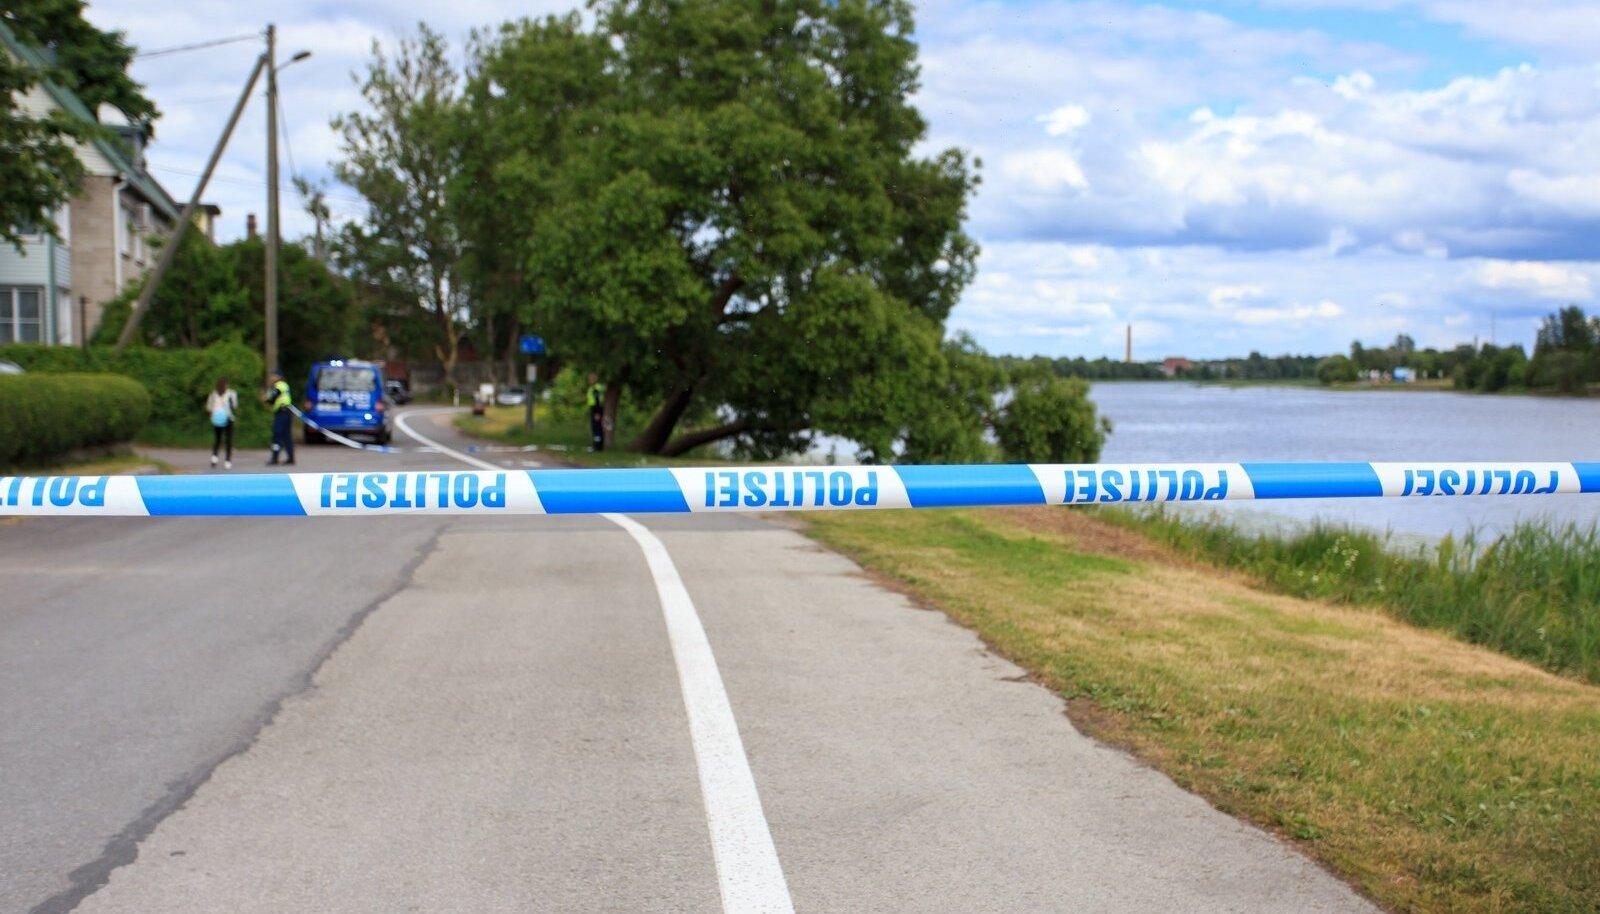 Pärnu jõest leiti naise surnukeha